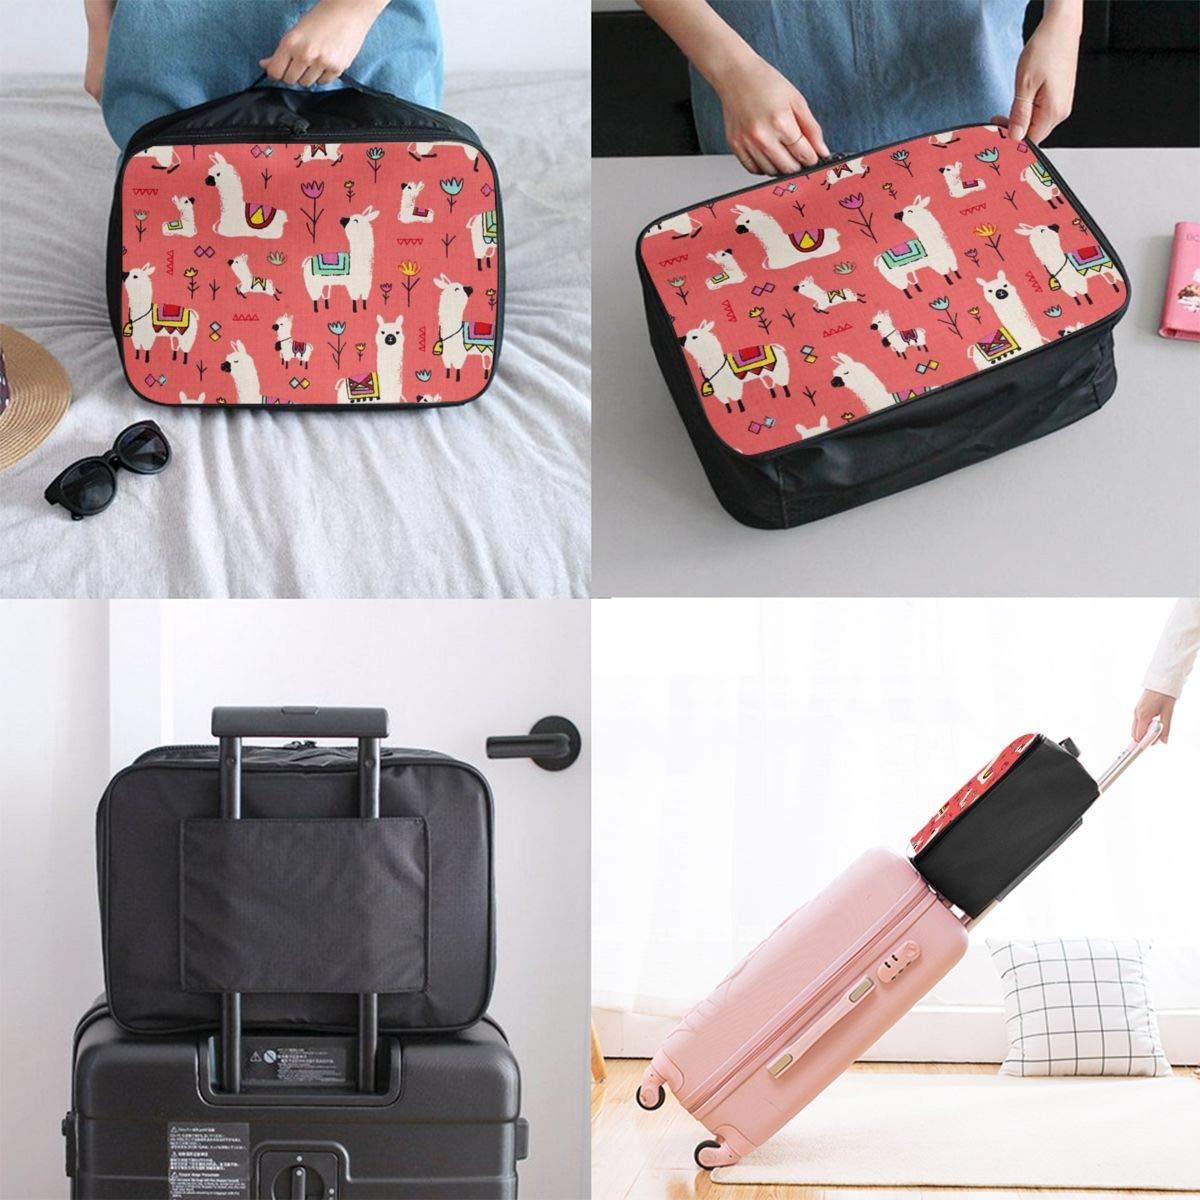 Gift for Boys Girls Luggage Duffel Bag Purple Floral Sugar Skull Lightweight Waterproof Storage Carry On Travel Duffle Tote Bag